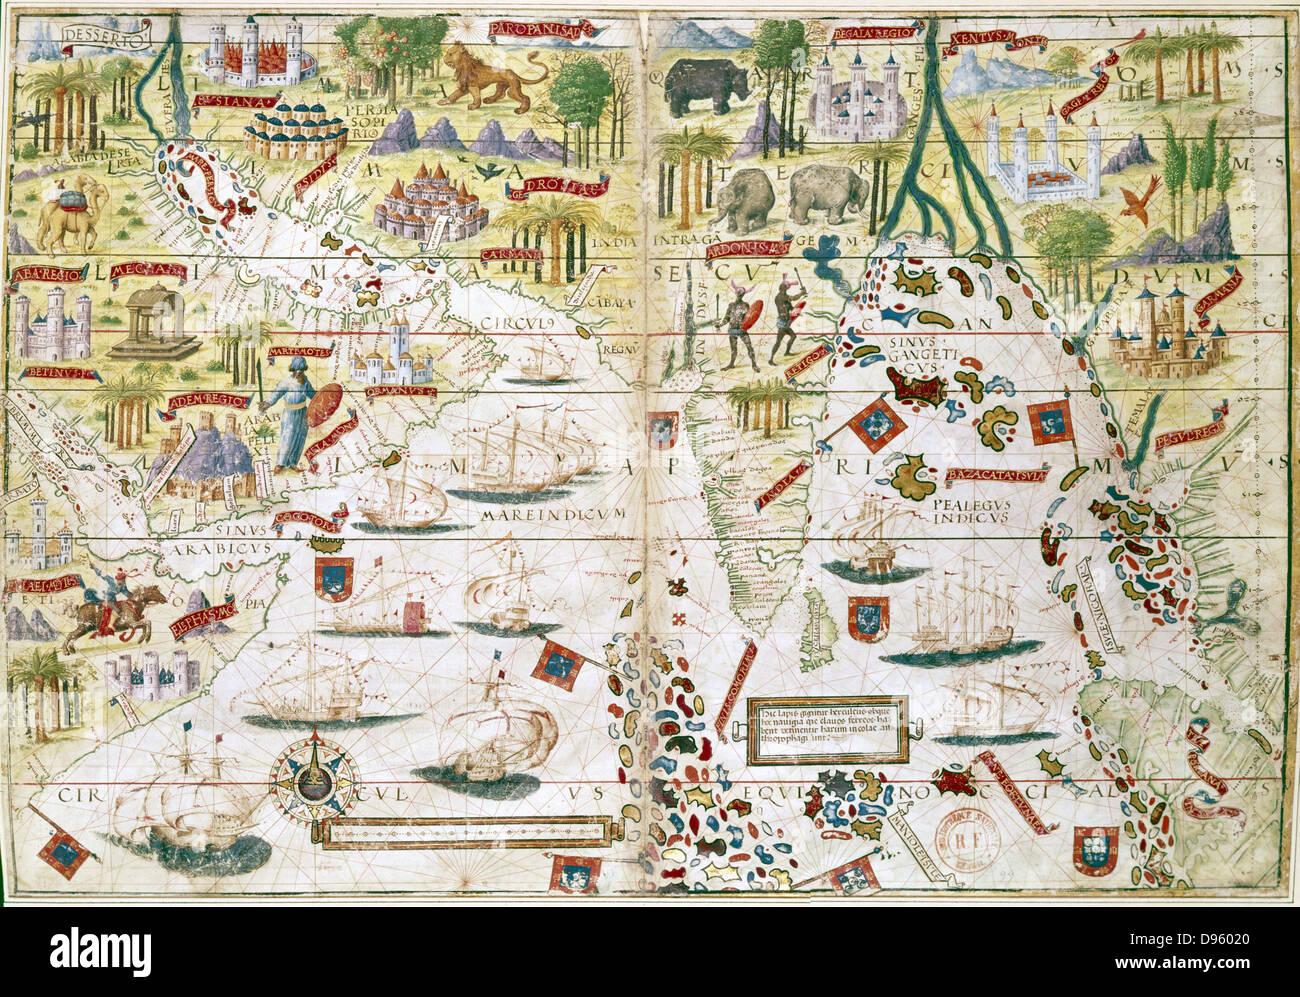 Cartina India Del Nord.Indian Map Cartography Immagini E Fotos Stock Alamy